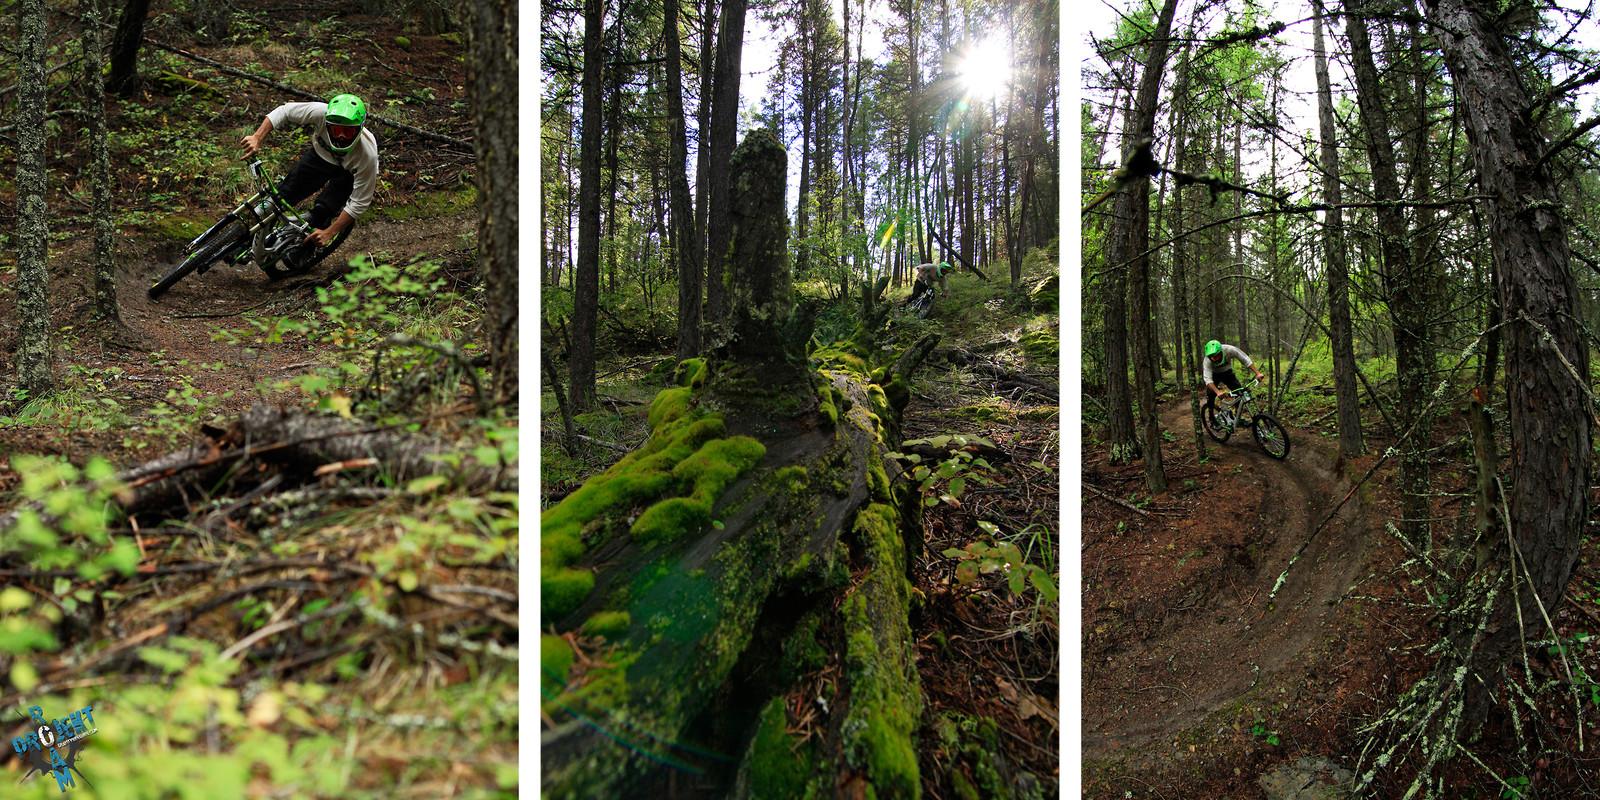 Whitefish, MT - projekt roam - Mountain Biking Pictures - Vital MTB